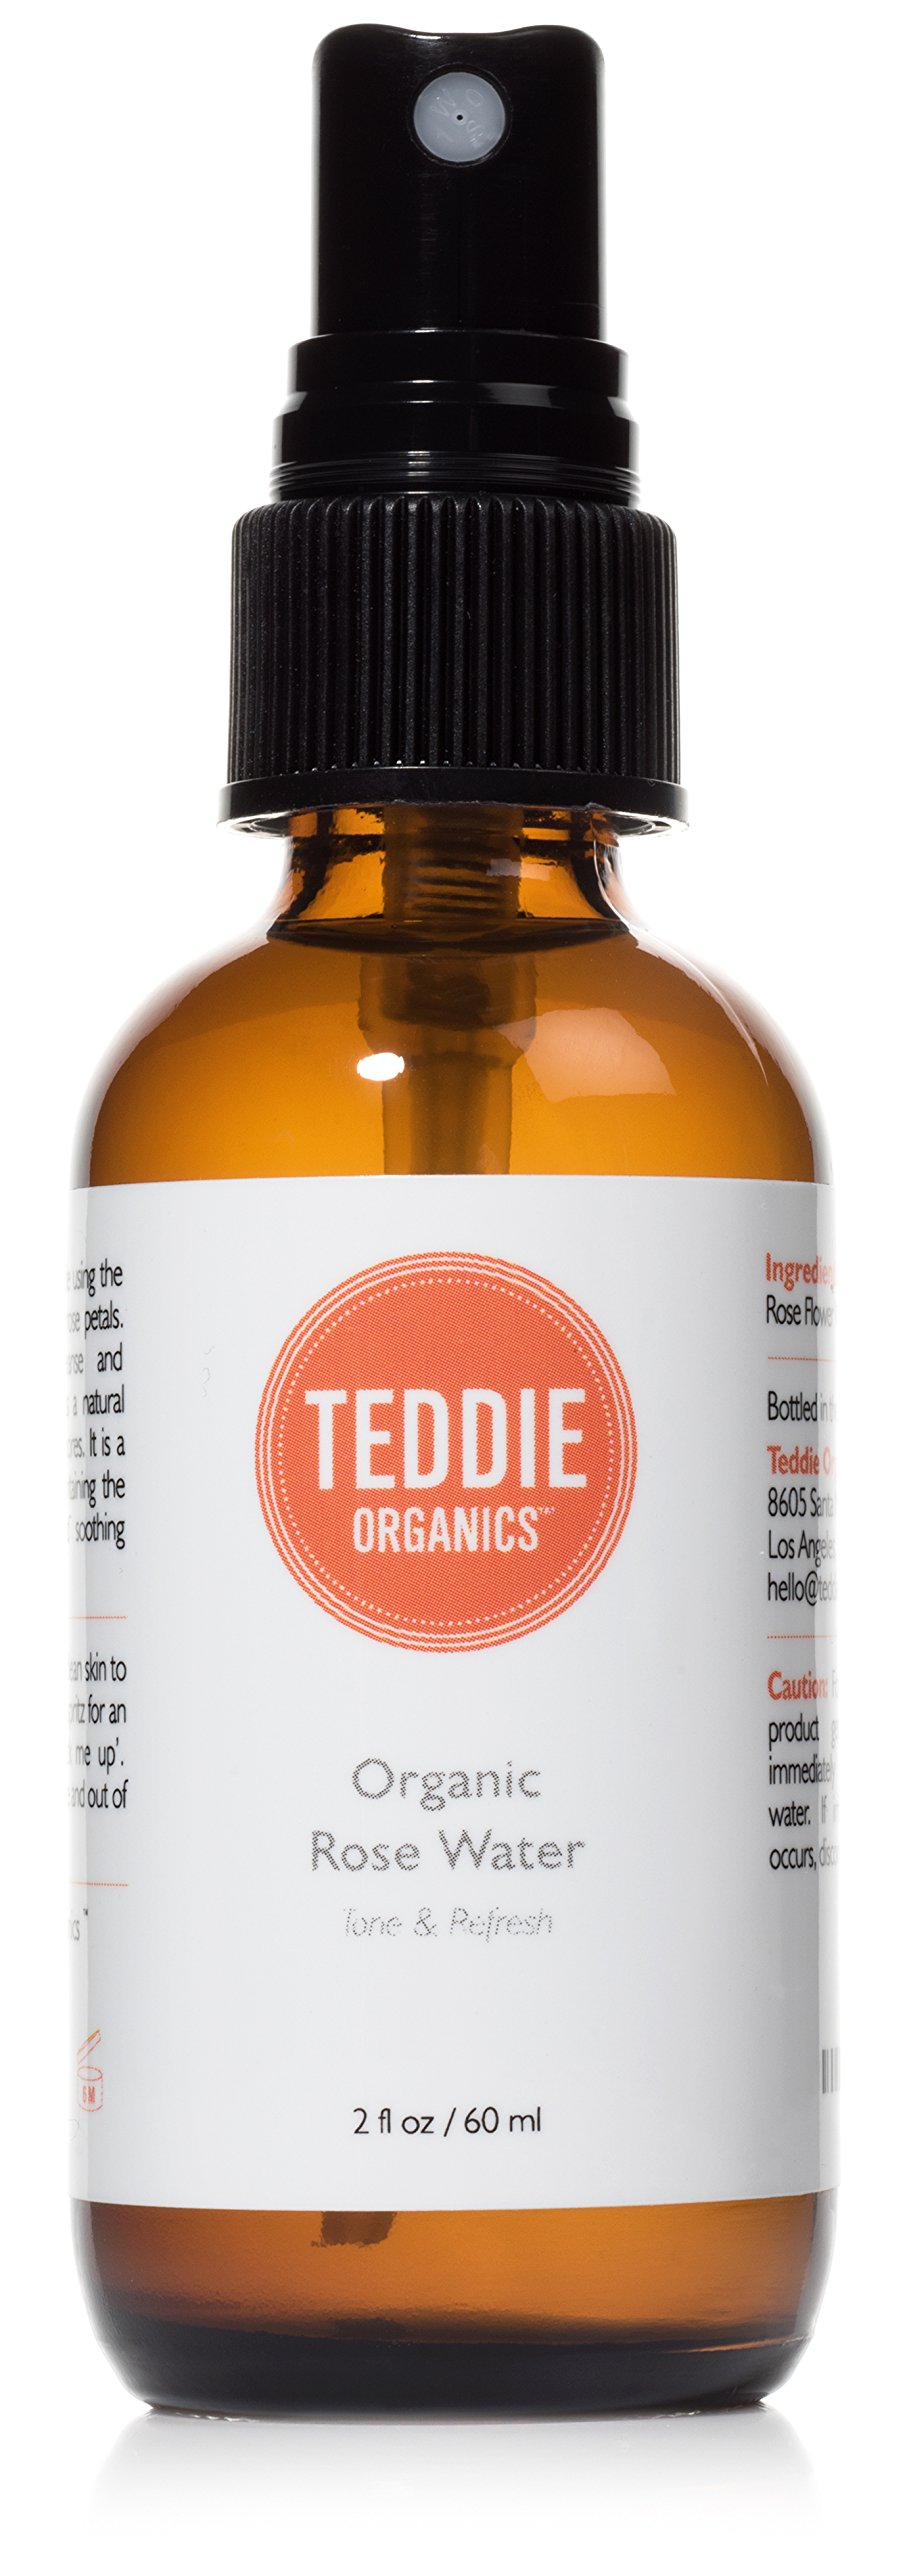 Teddie Organics Rose Water Facial Toner Spray 2oz by Teddie Organics